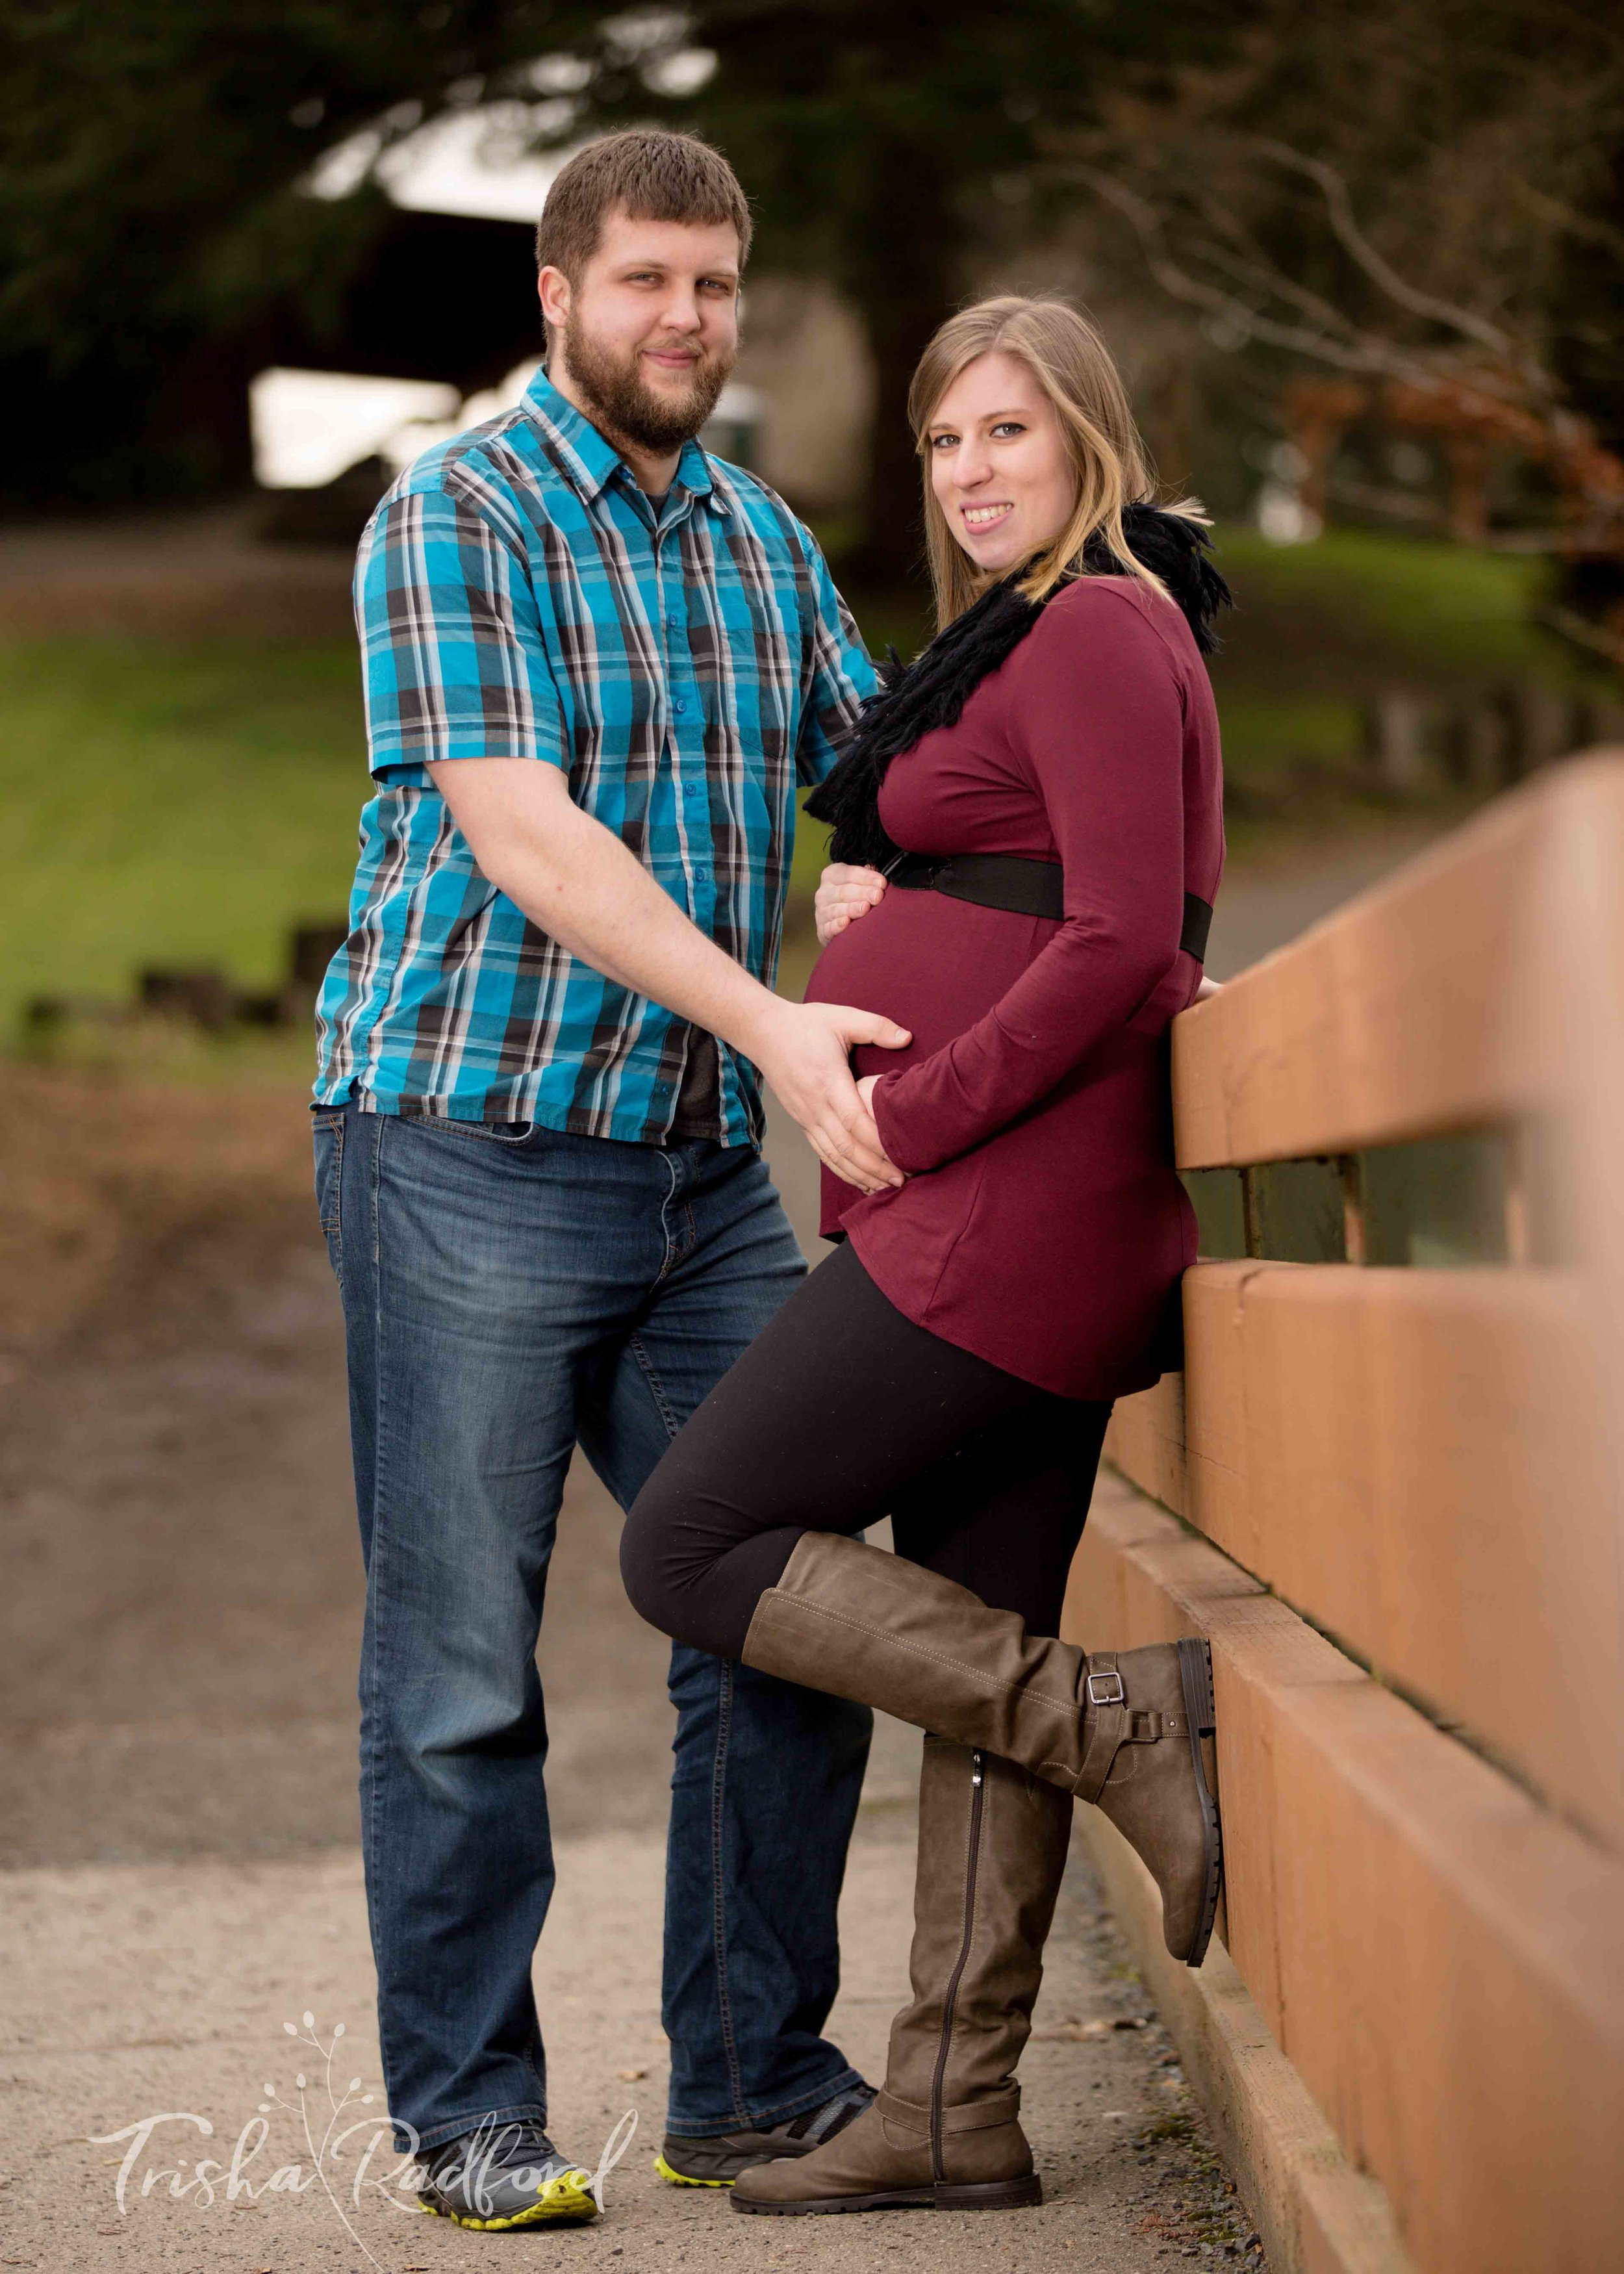 Snohomish County Photographer   Maternity Photography   Jennings Park, Marysville